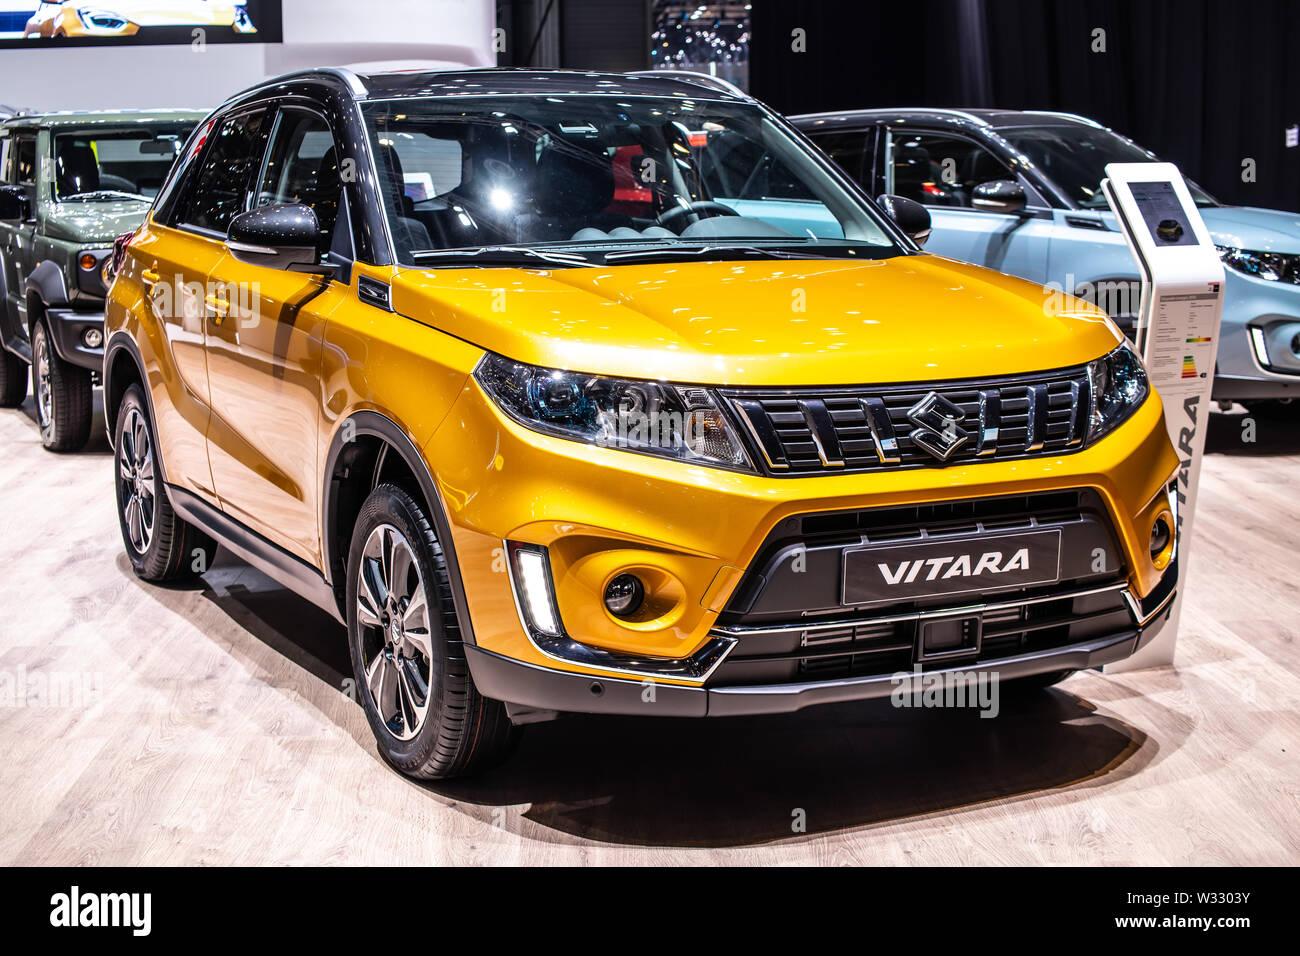 Suzuki Vitara Stock Photos & Suzuki Vitara Stock Images - Alamy